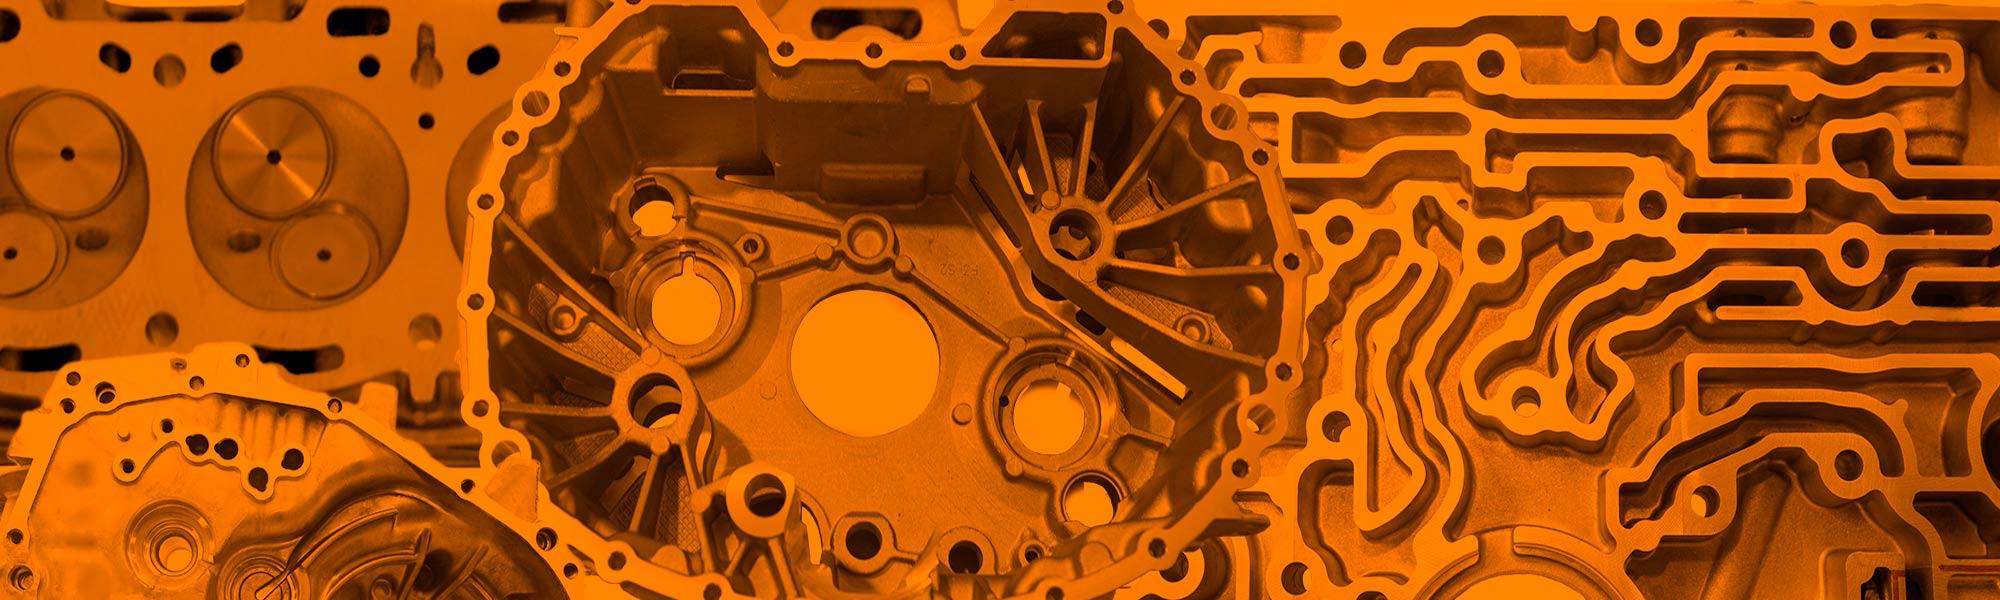 aluminium components K_MILL surface finishing